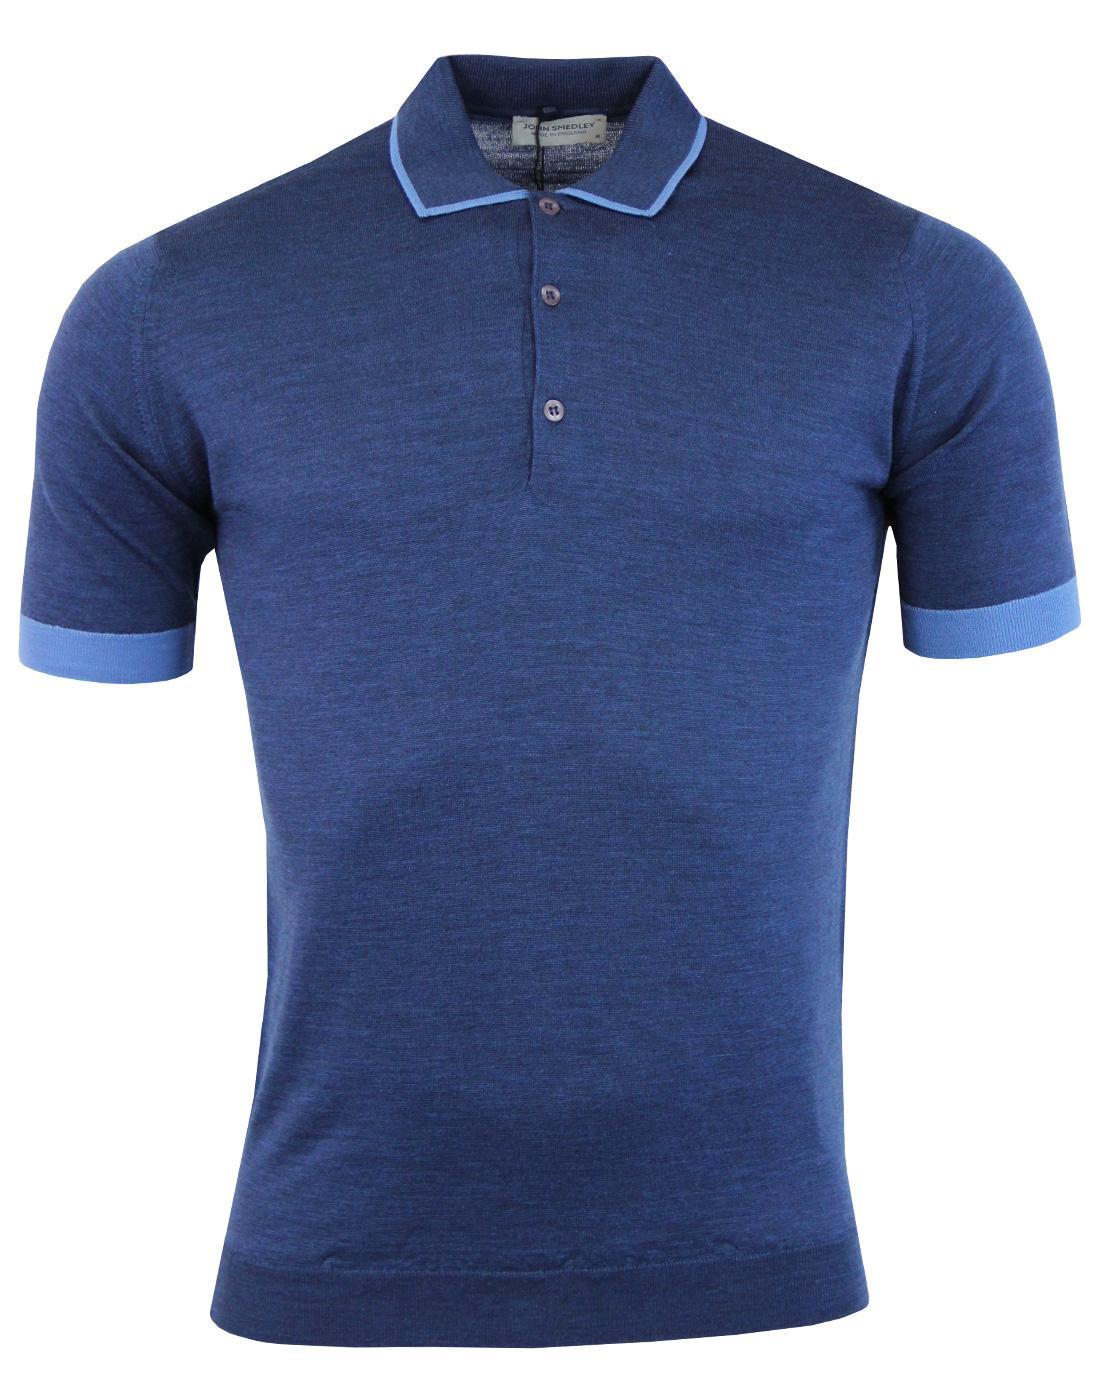 Nailsea JOHN SMEDLEY 1960s Mod Tipped Polo Shirt